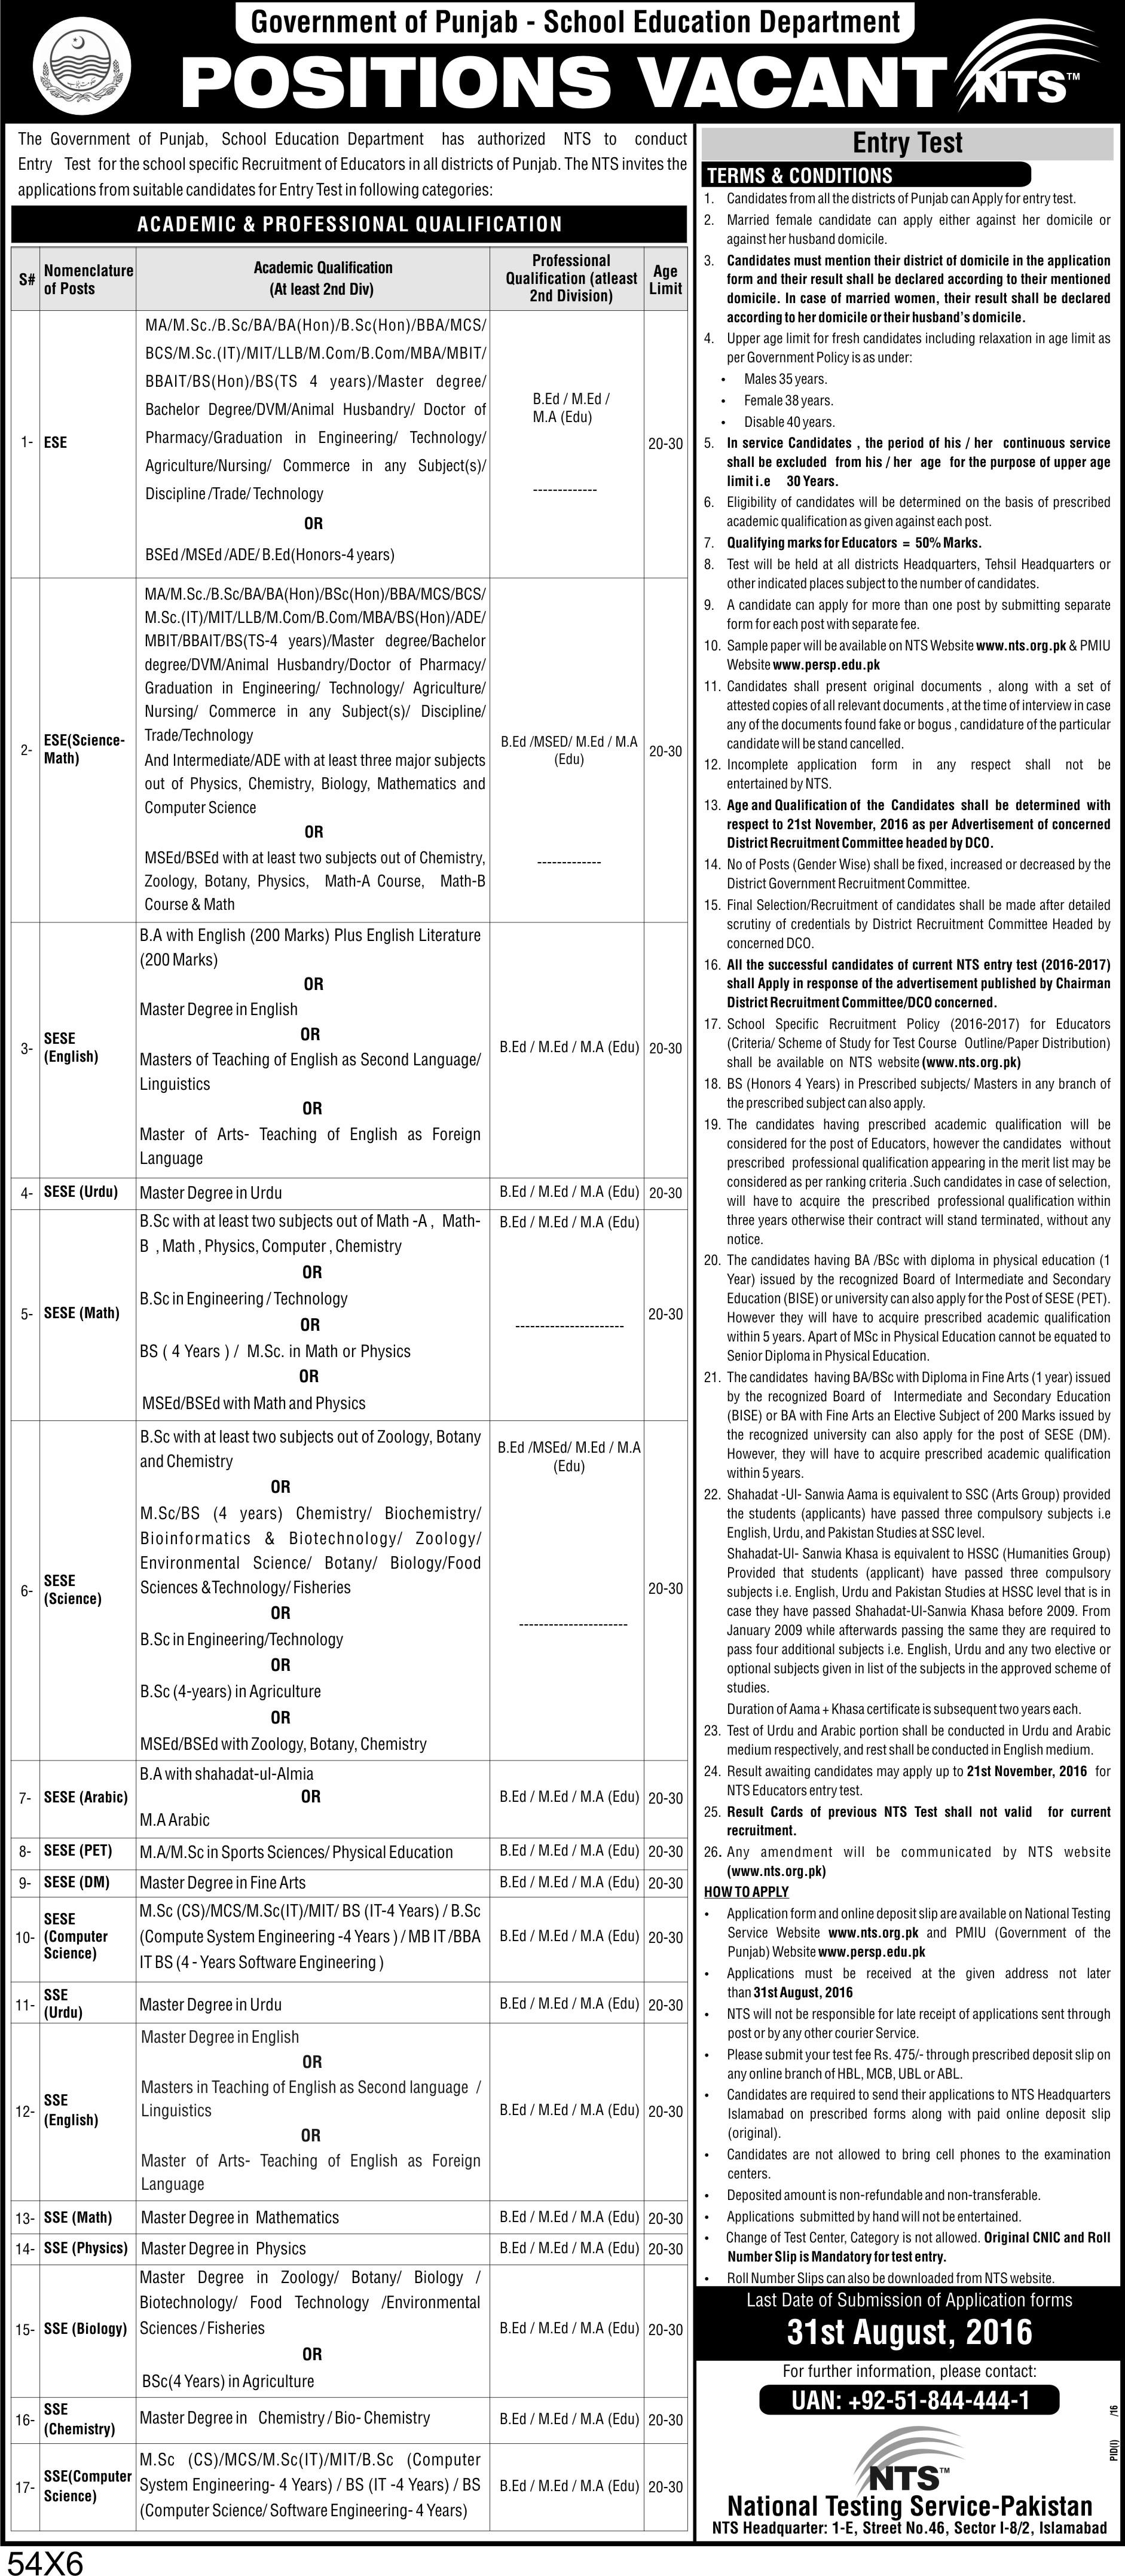 Punjab School Education Department Jobs 2016 NTS Educators Form, Last Date